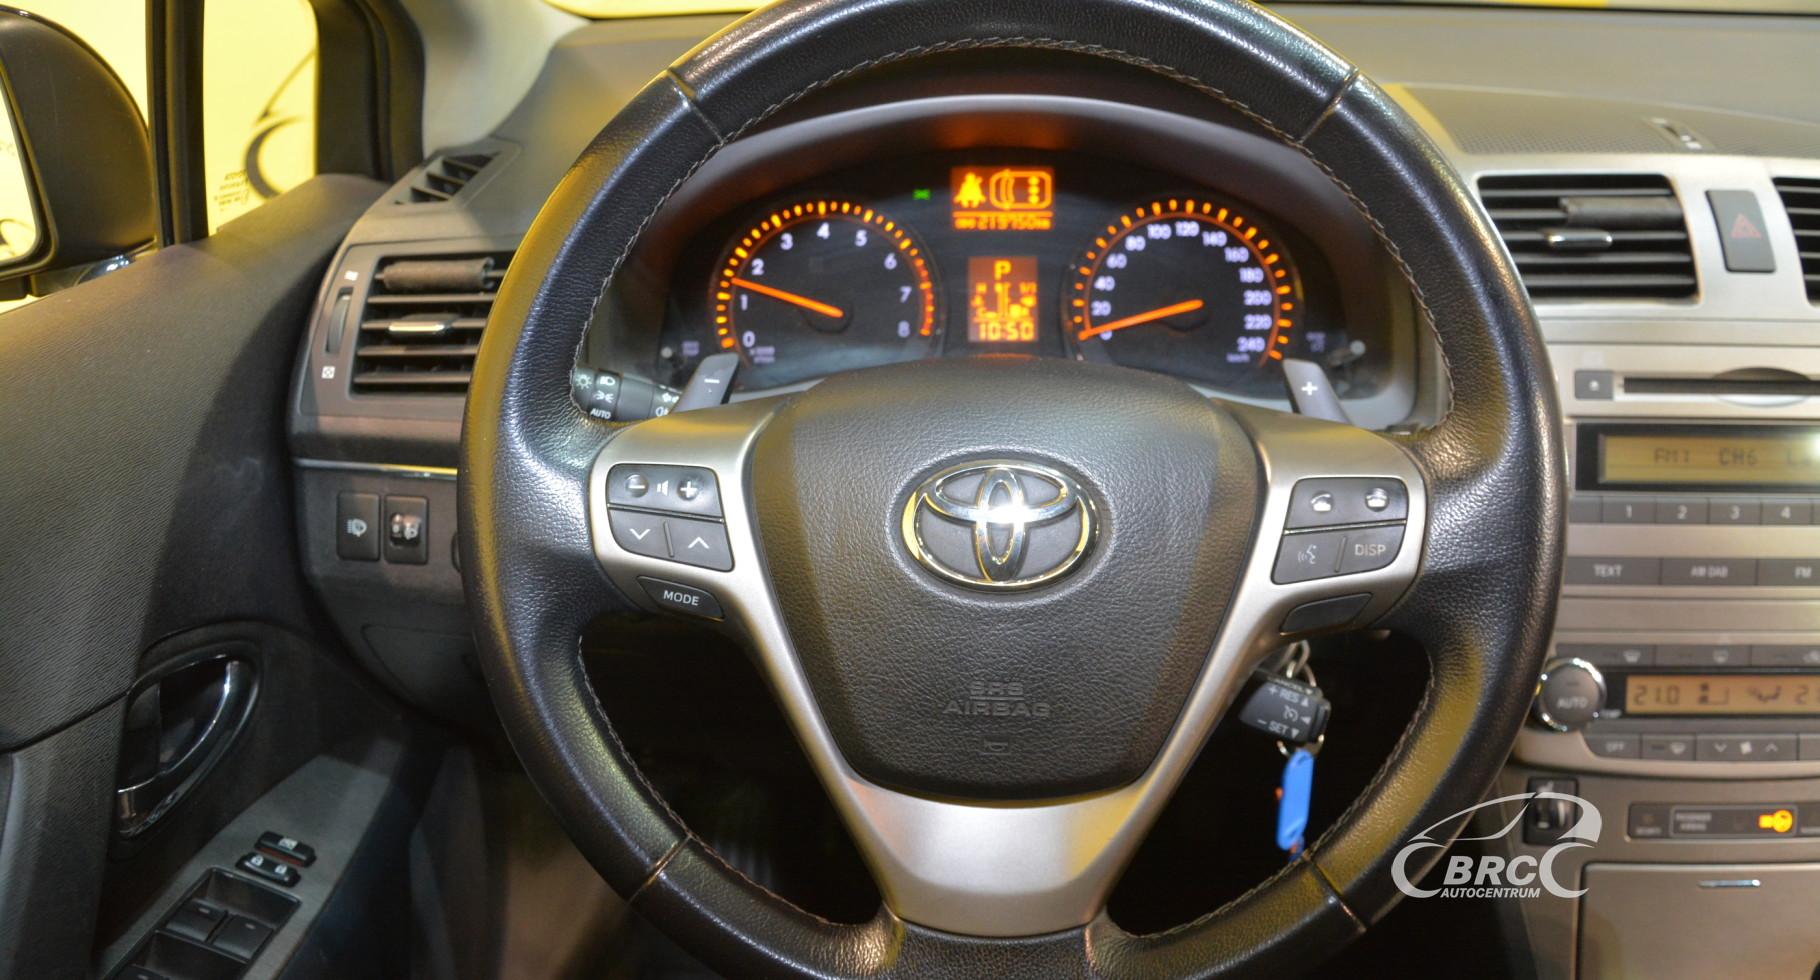 Toyota Avensis 2.0 VVT-i Linea Sol Automatas